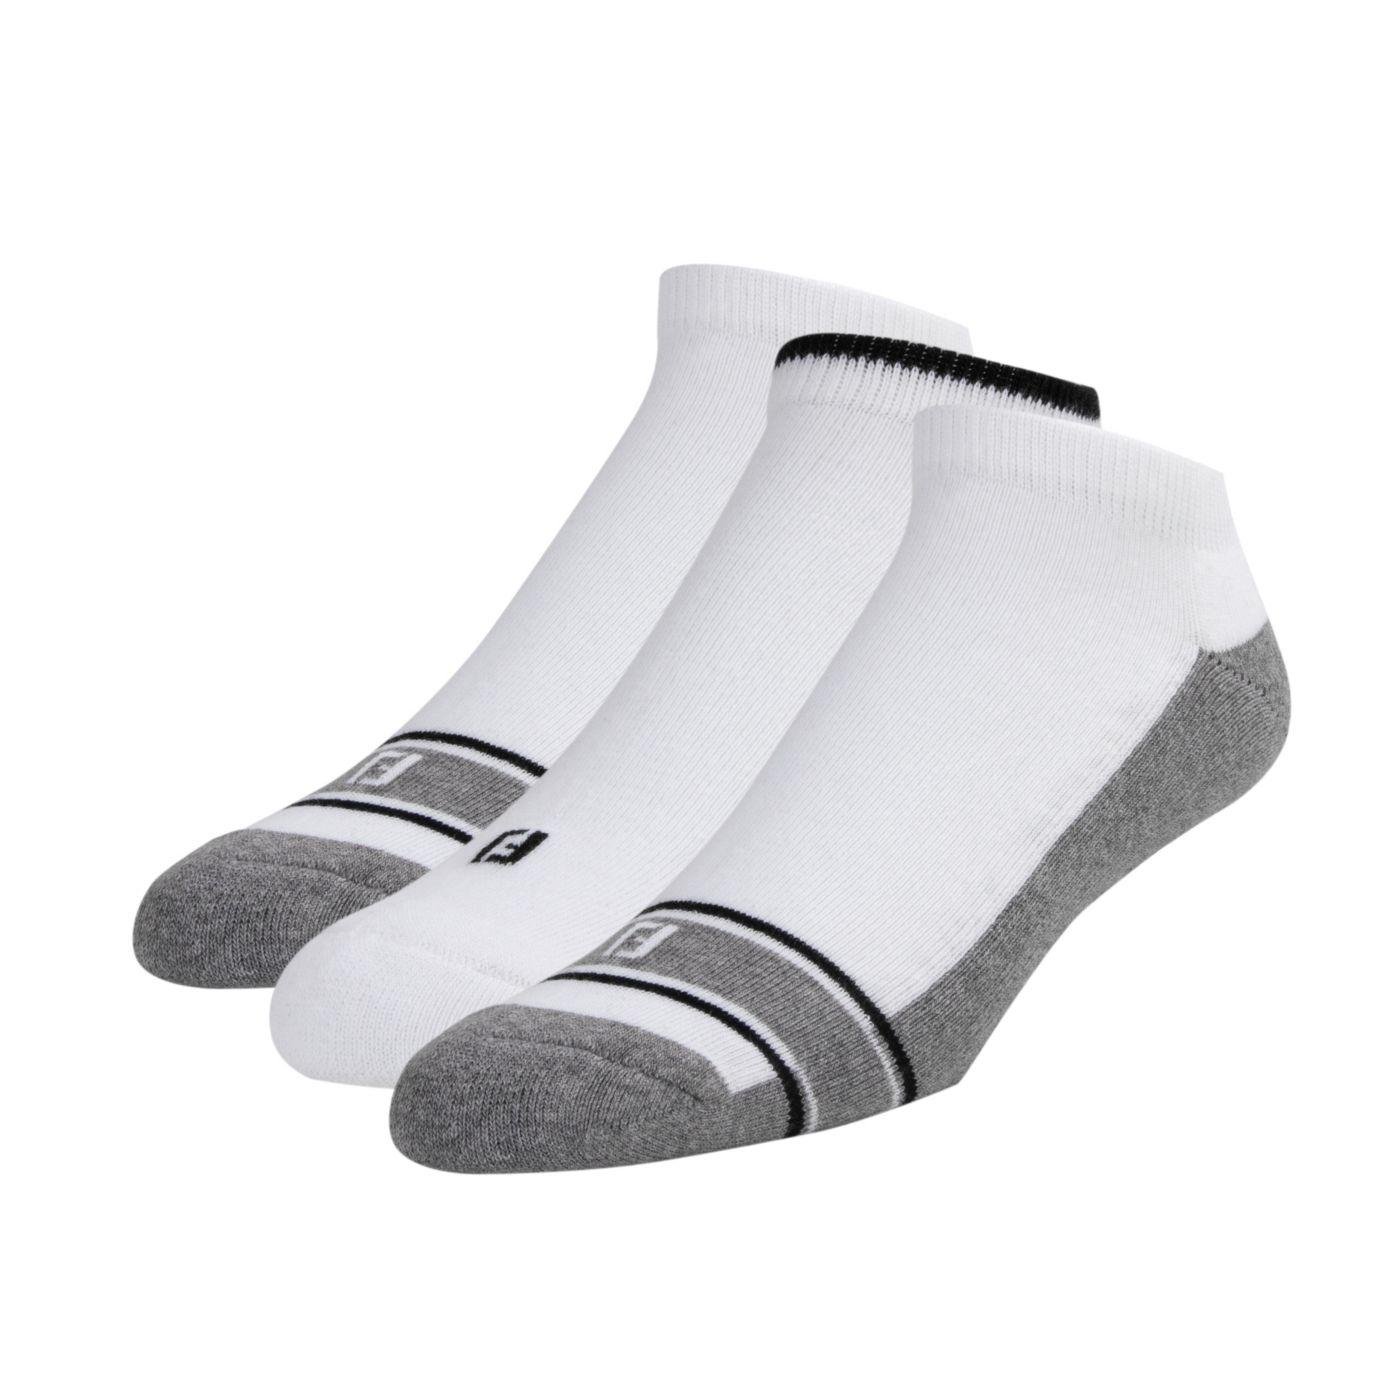 FootJoy Men's ComfortSof Low Cut Golf Socks - 3 Pack